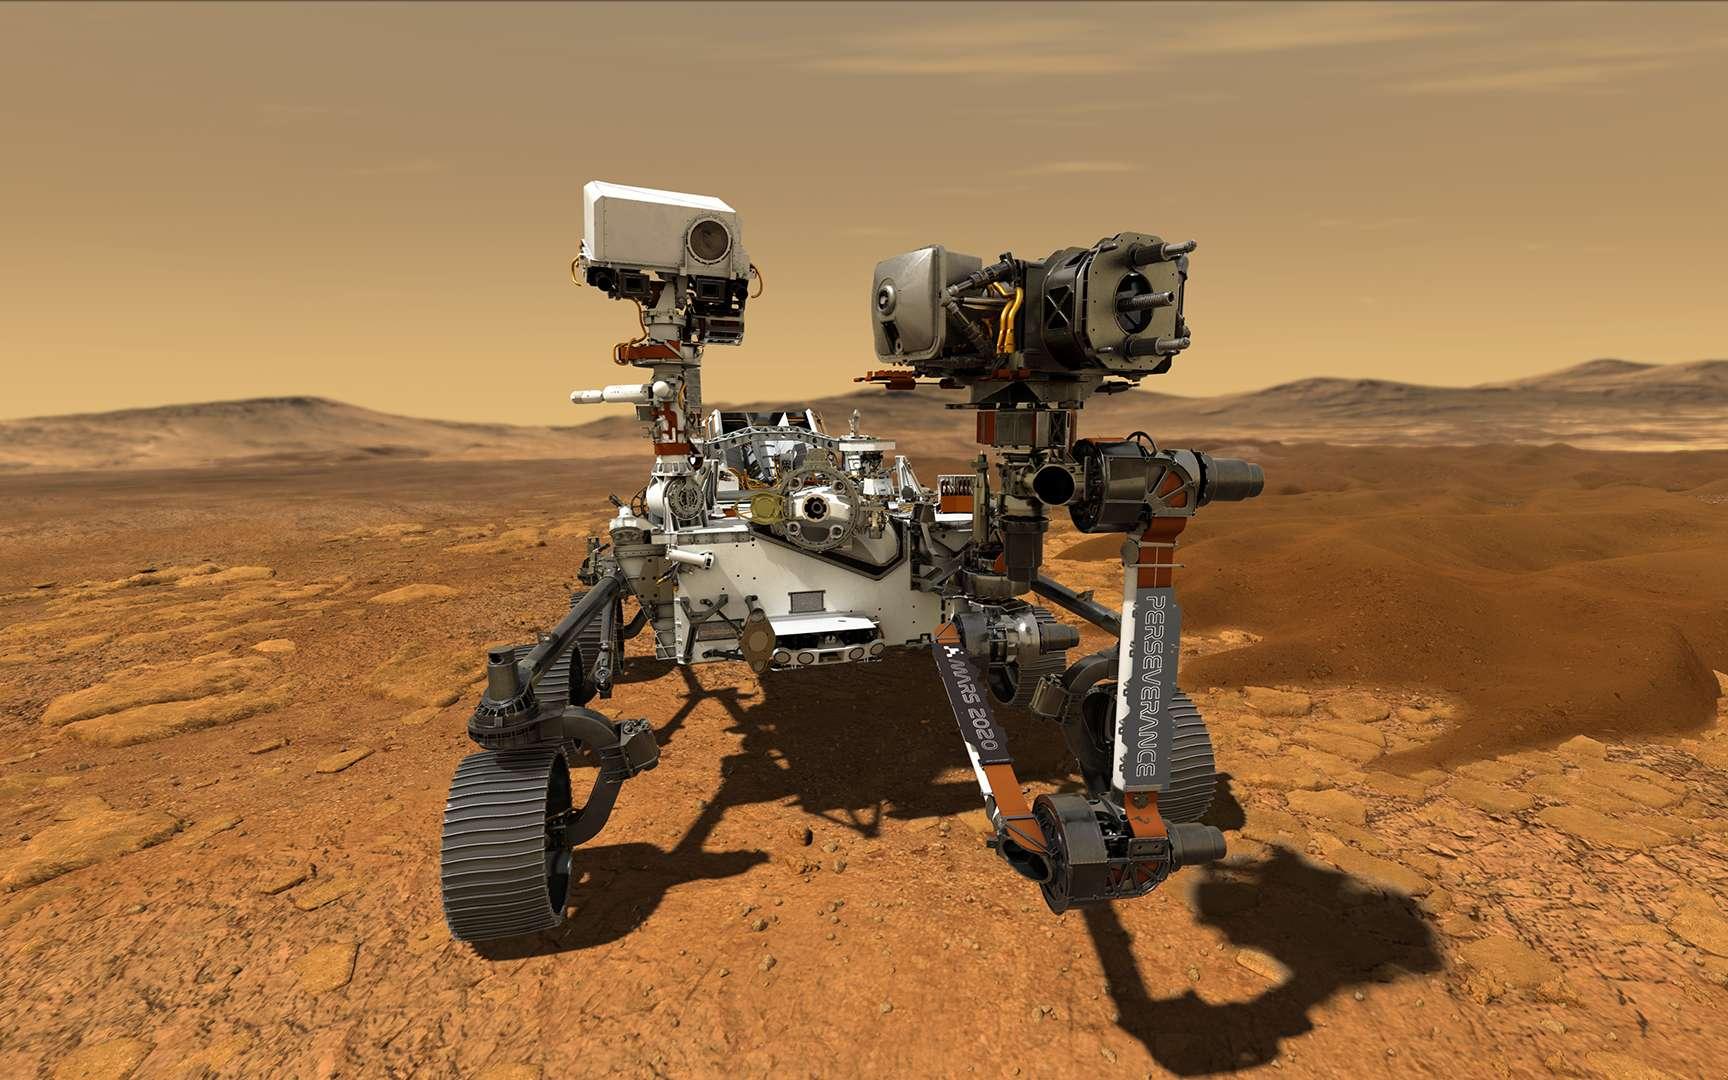 Illustration de Perseverance en action sur Mars. © Nasa, JPL-Caltech